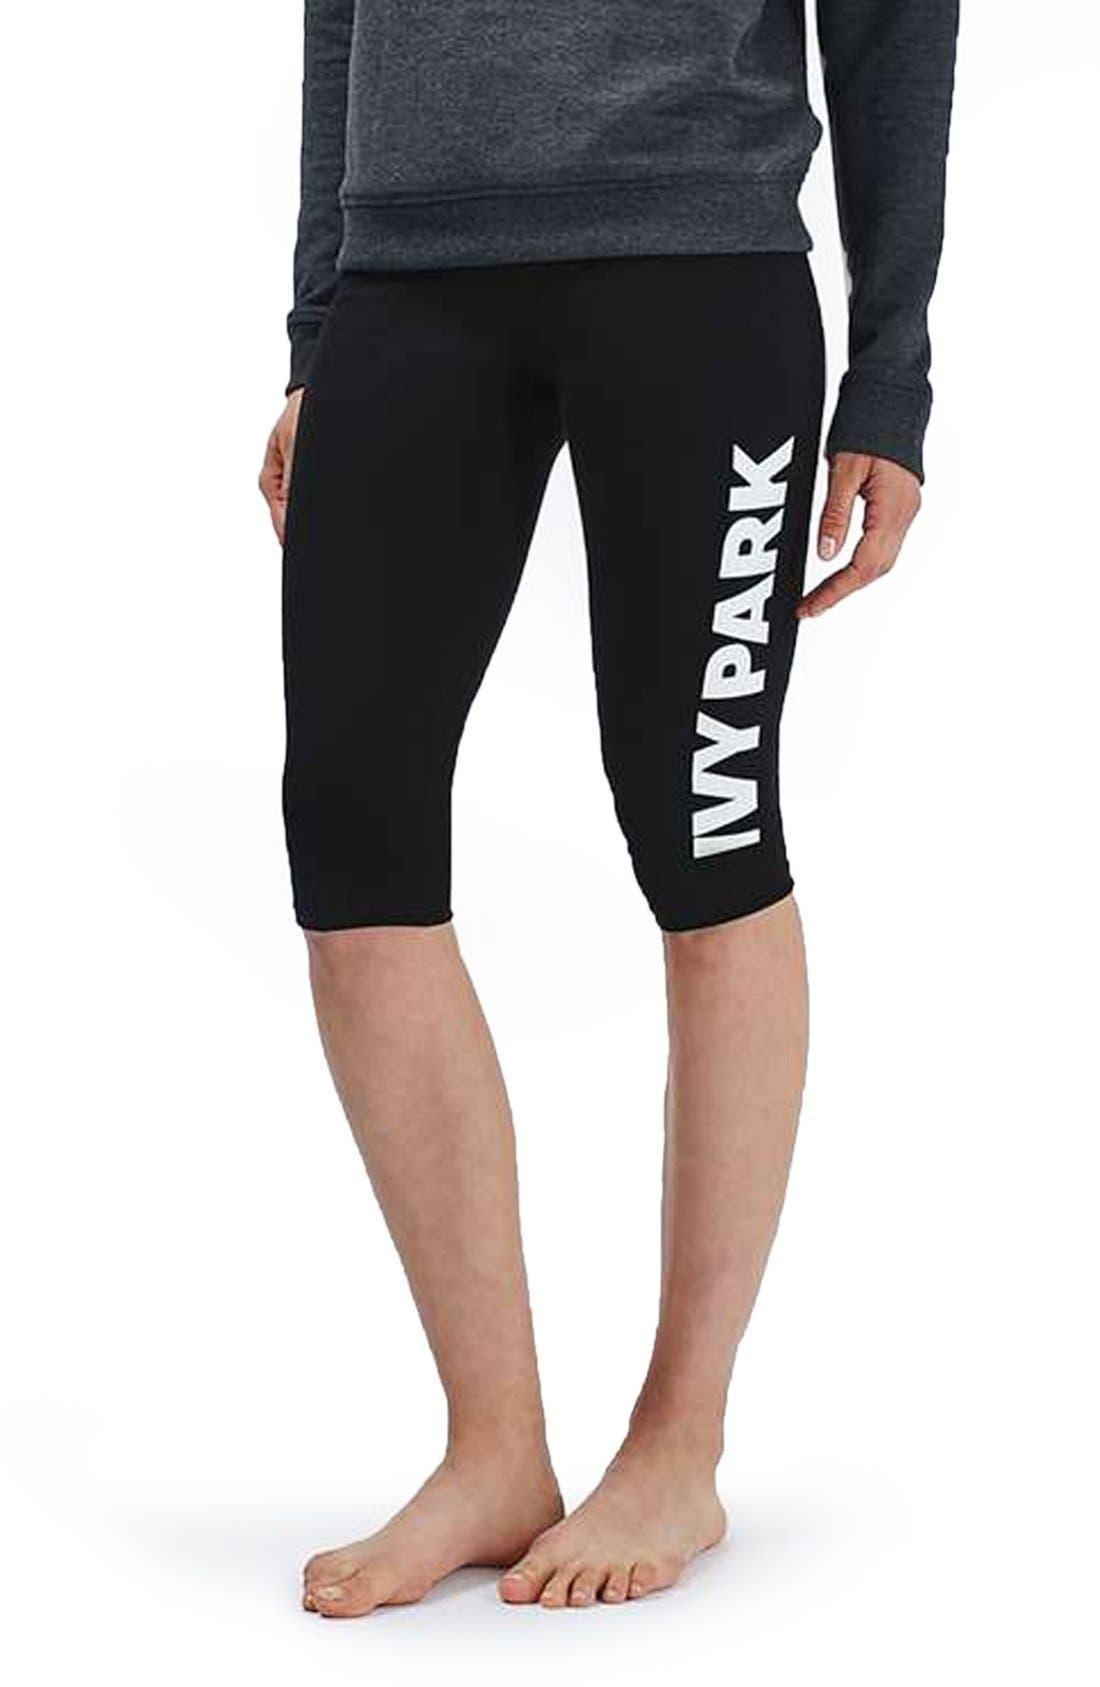 Alternate Image 1 Selected - IVY PARK® Logo Capri Leggings